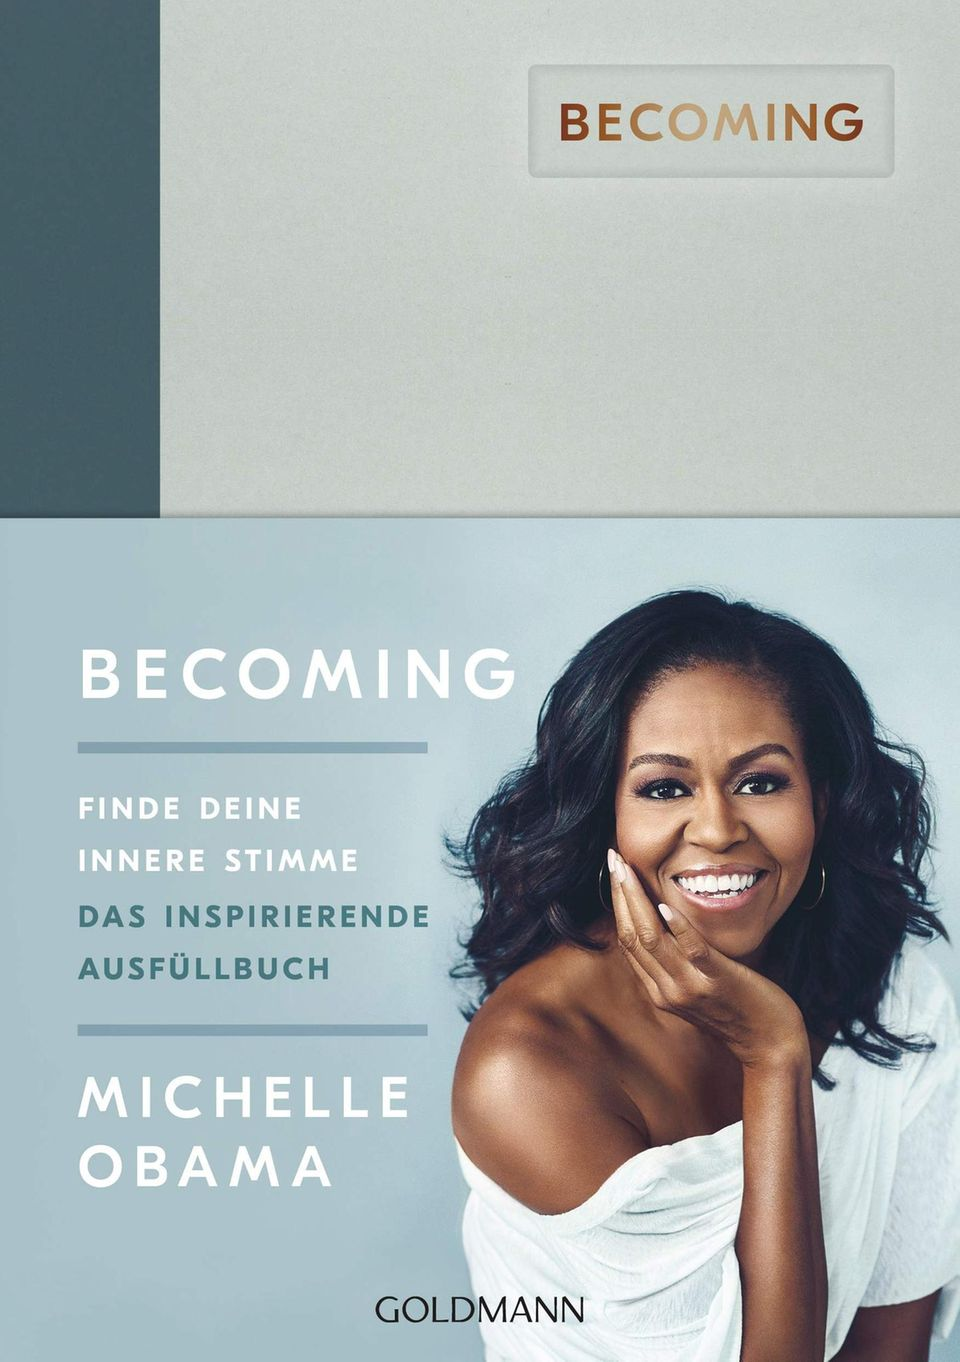 Michele Obama: Becoming – Ausfüllbuch